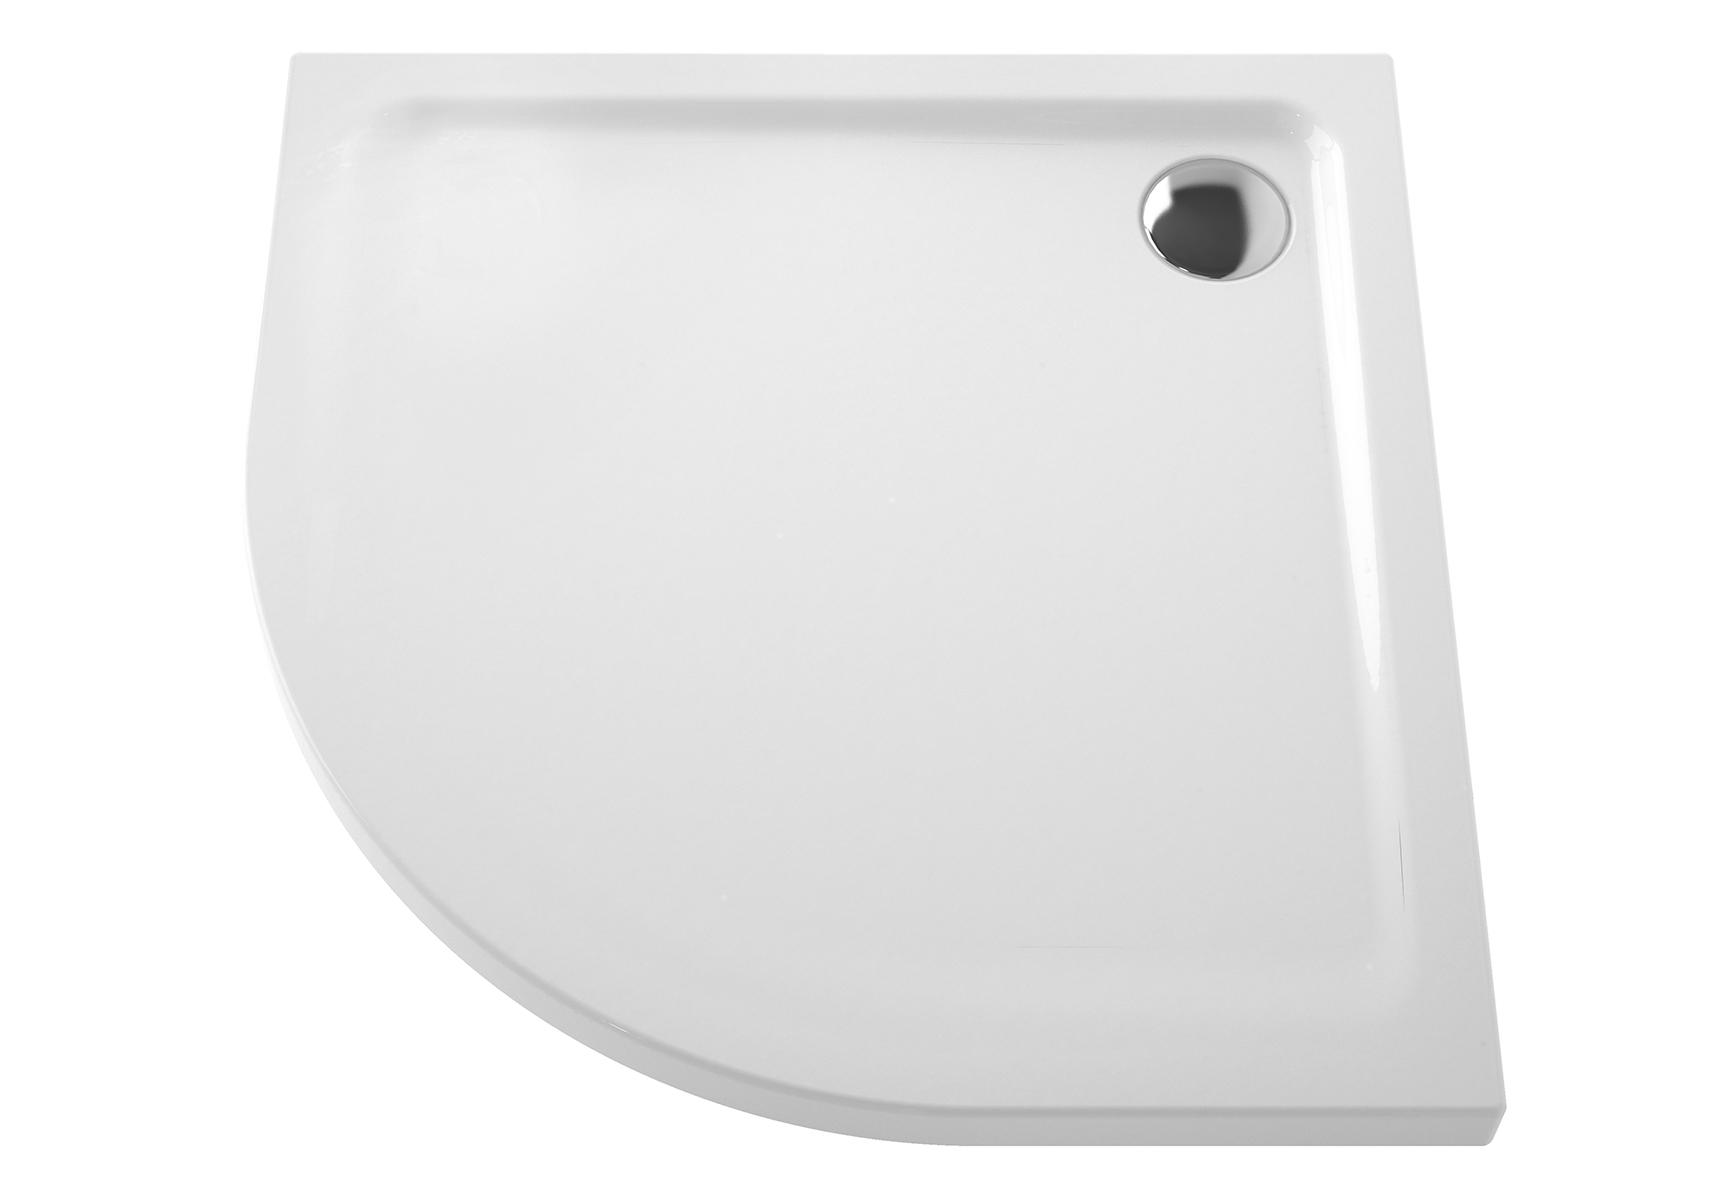 Arkitekt receveur à encastrer ou à poser extra plat, quart de rond, 90  x  90 cm